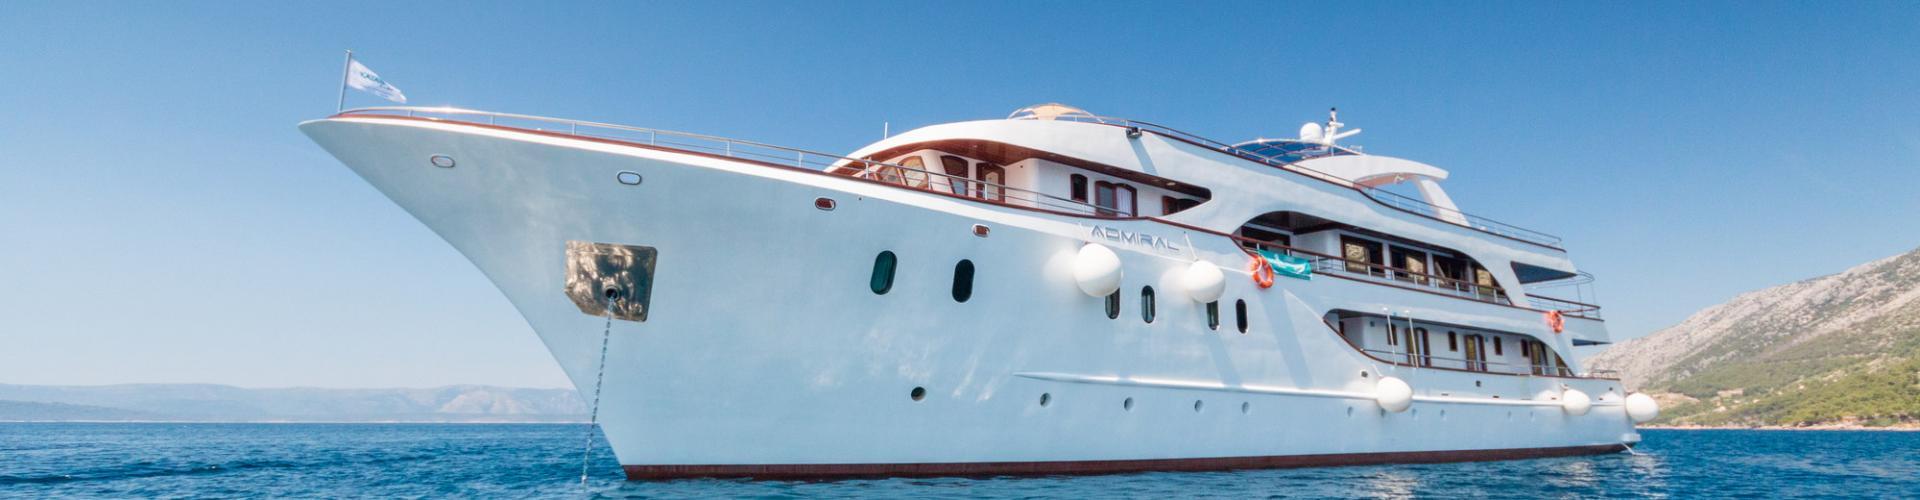 2015. Deluxe cruiser MV Admiral